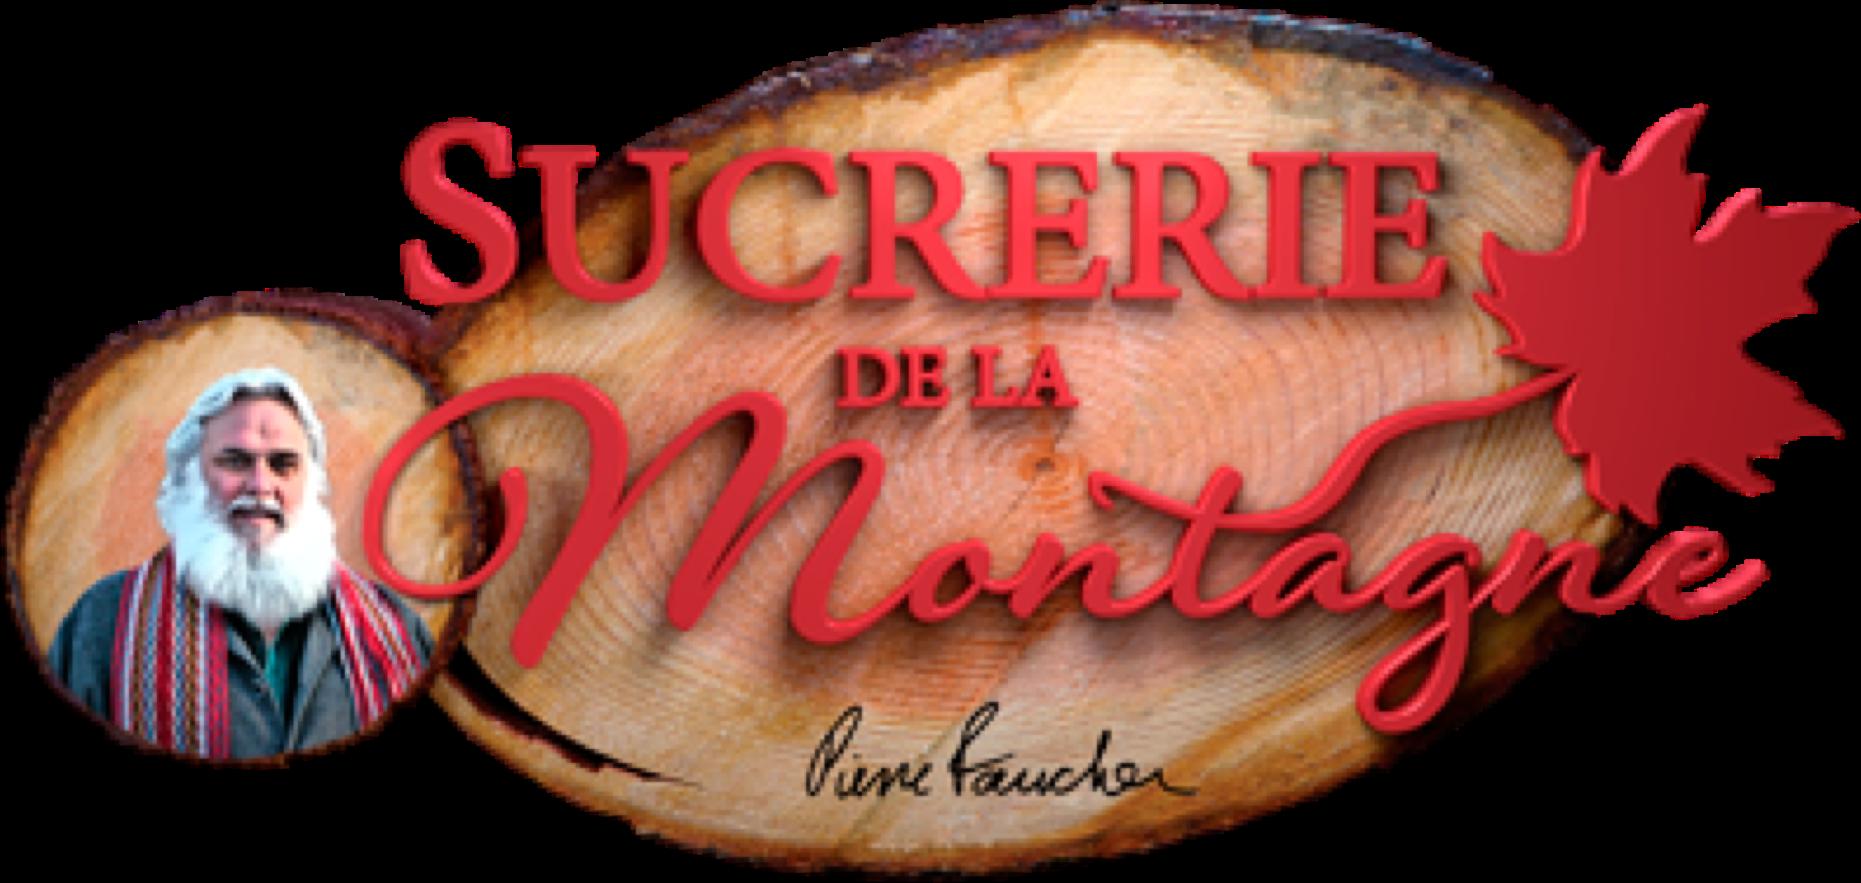 Sucrerie de la Montagne in 2020 Sugar shack, Christmas